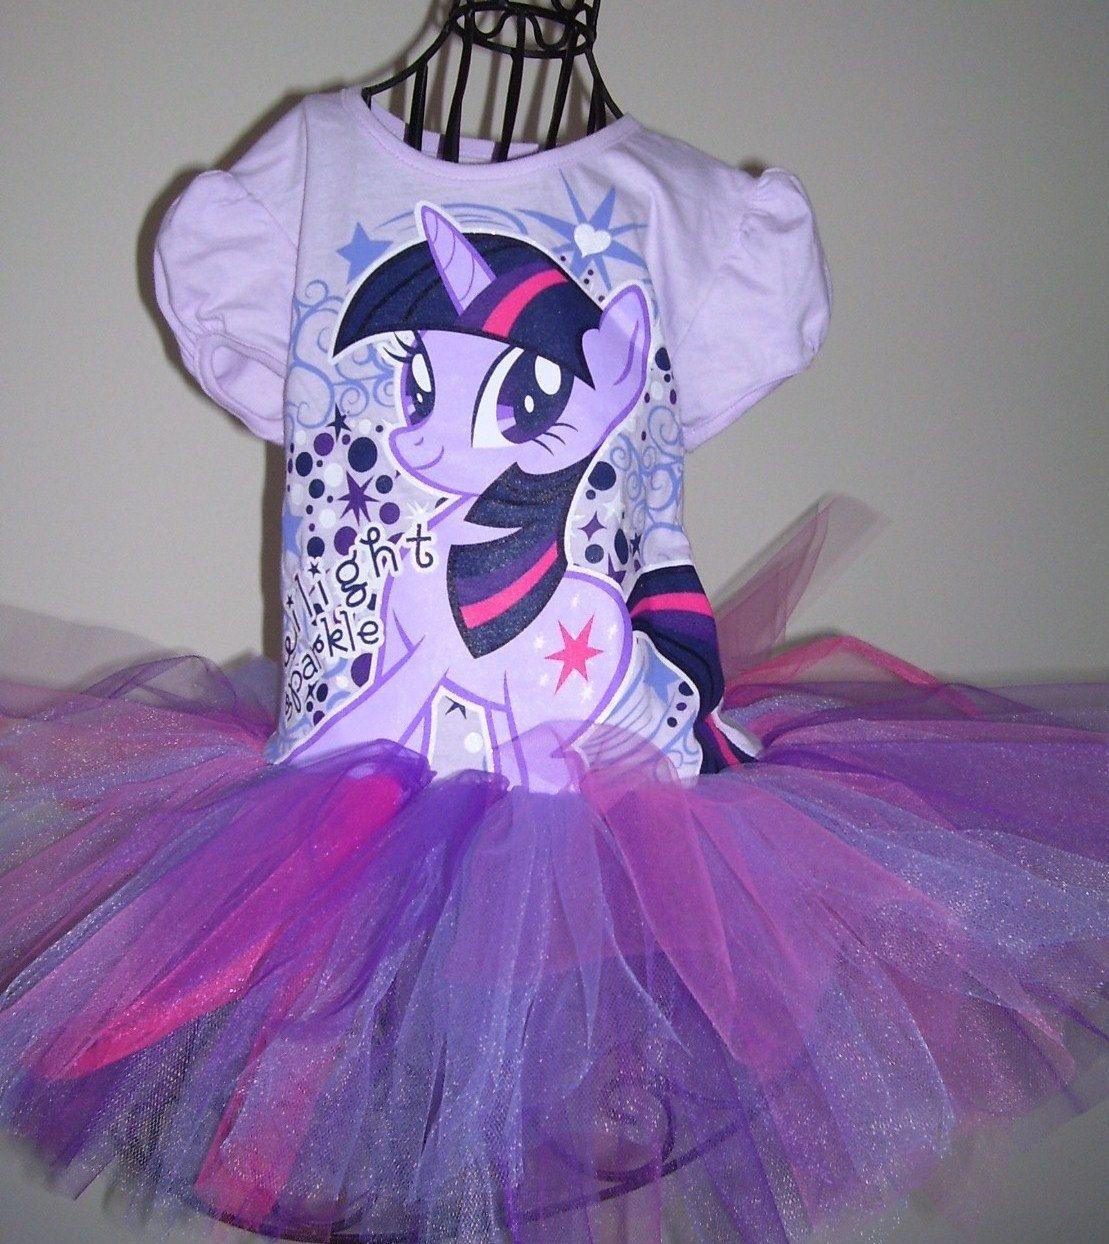 dd6cc722d My Little Pony ..Twilight Sparkle tutu dress. sizes 2t..3t..4t..5t ...